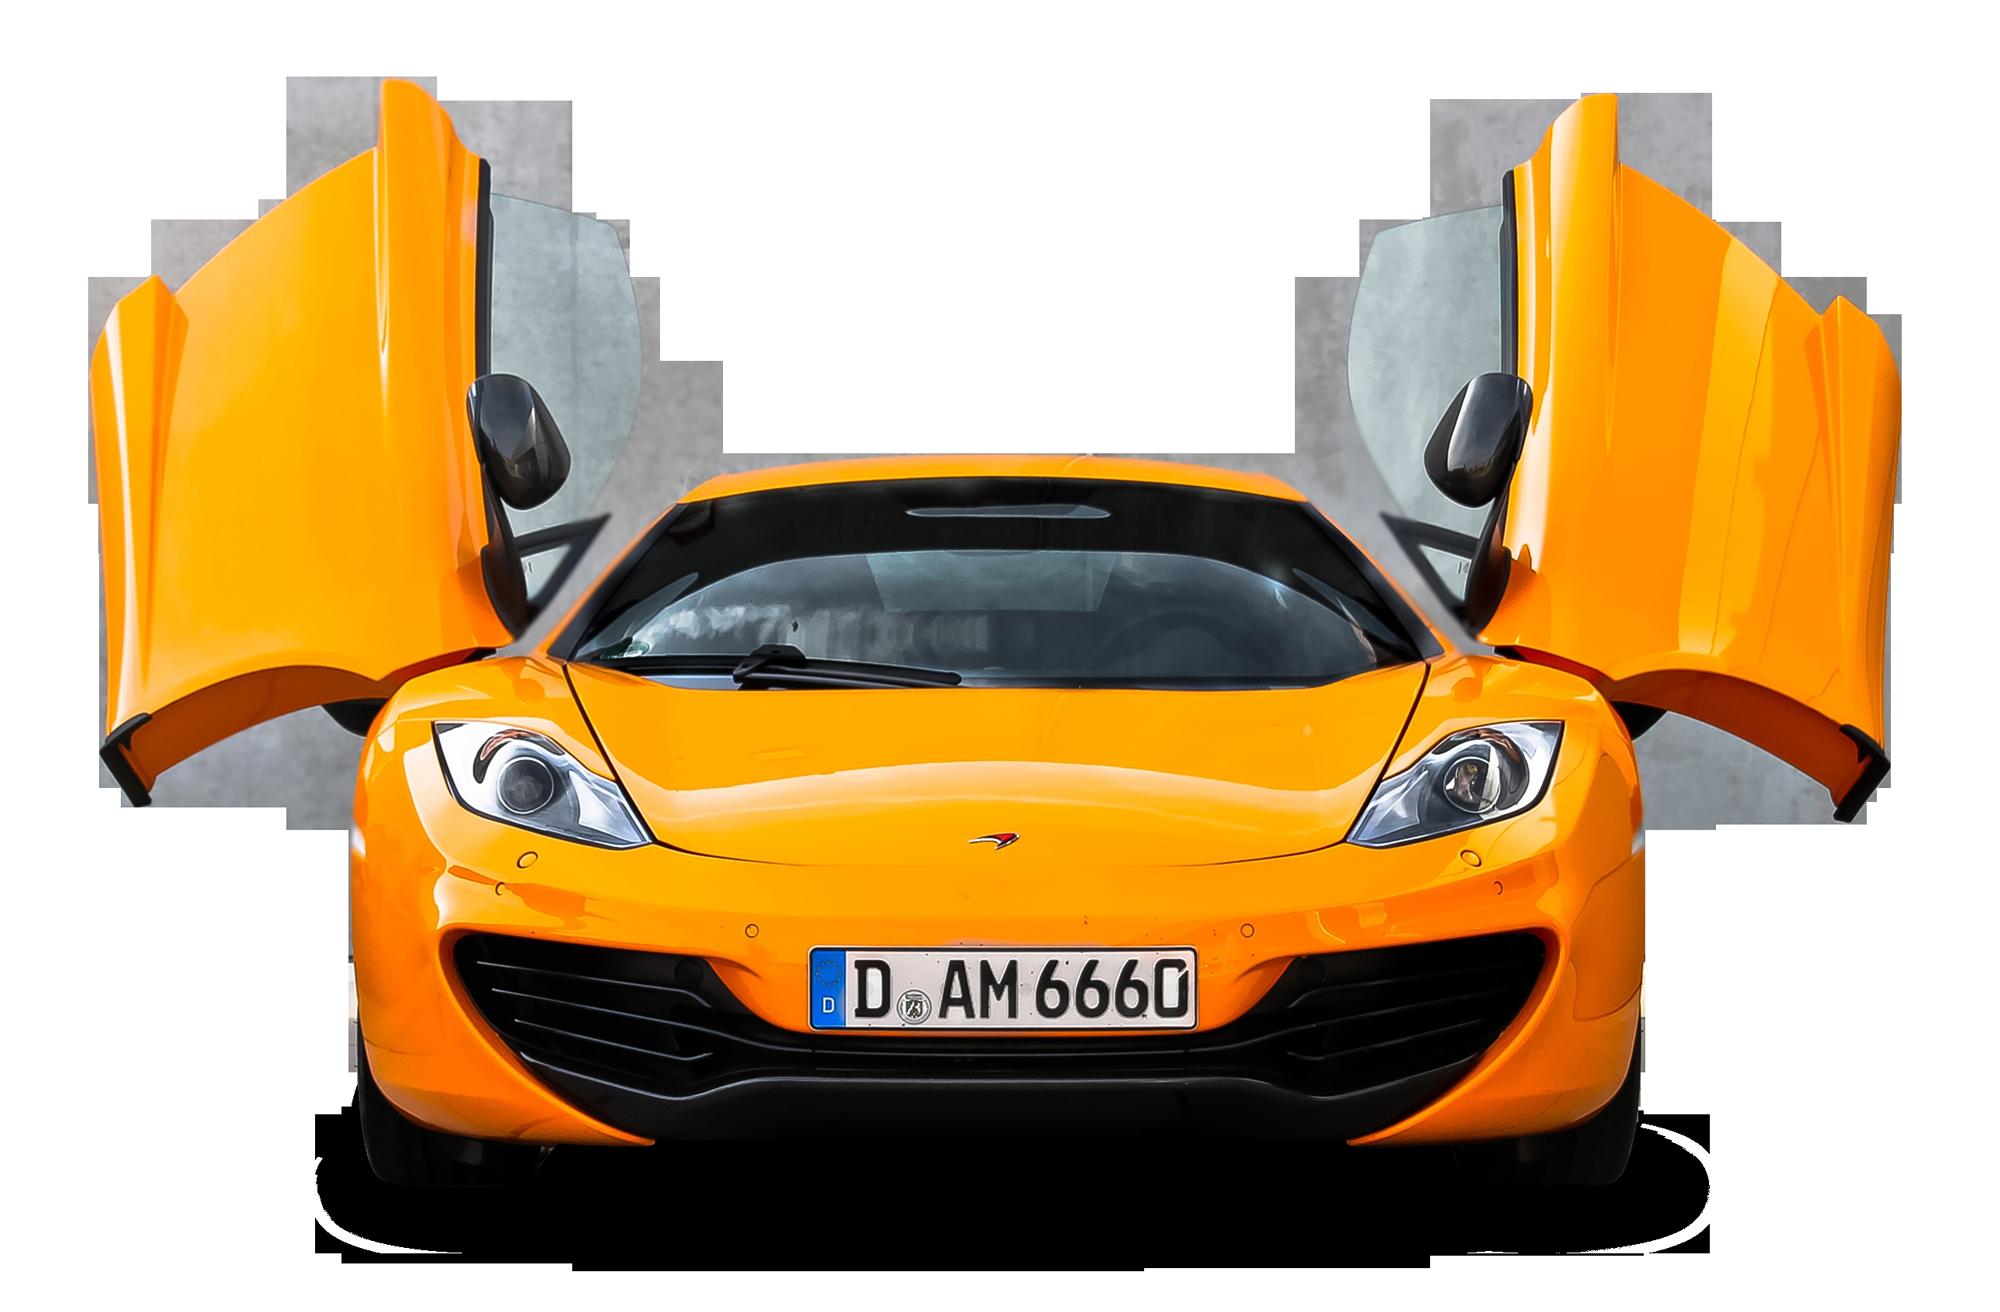 Transparent free download pngmart. Car png images